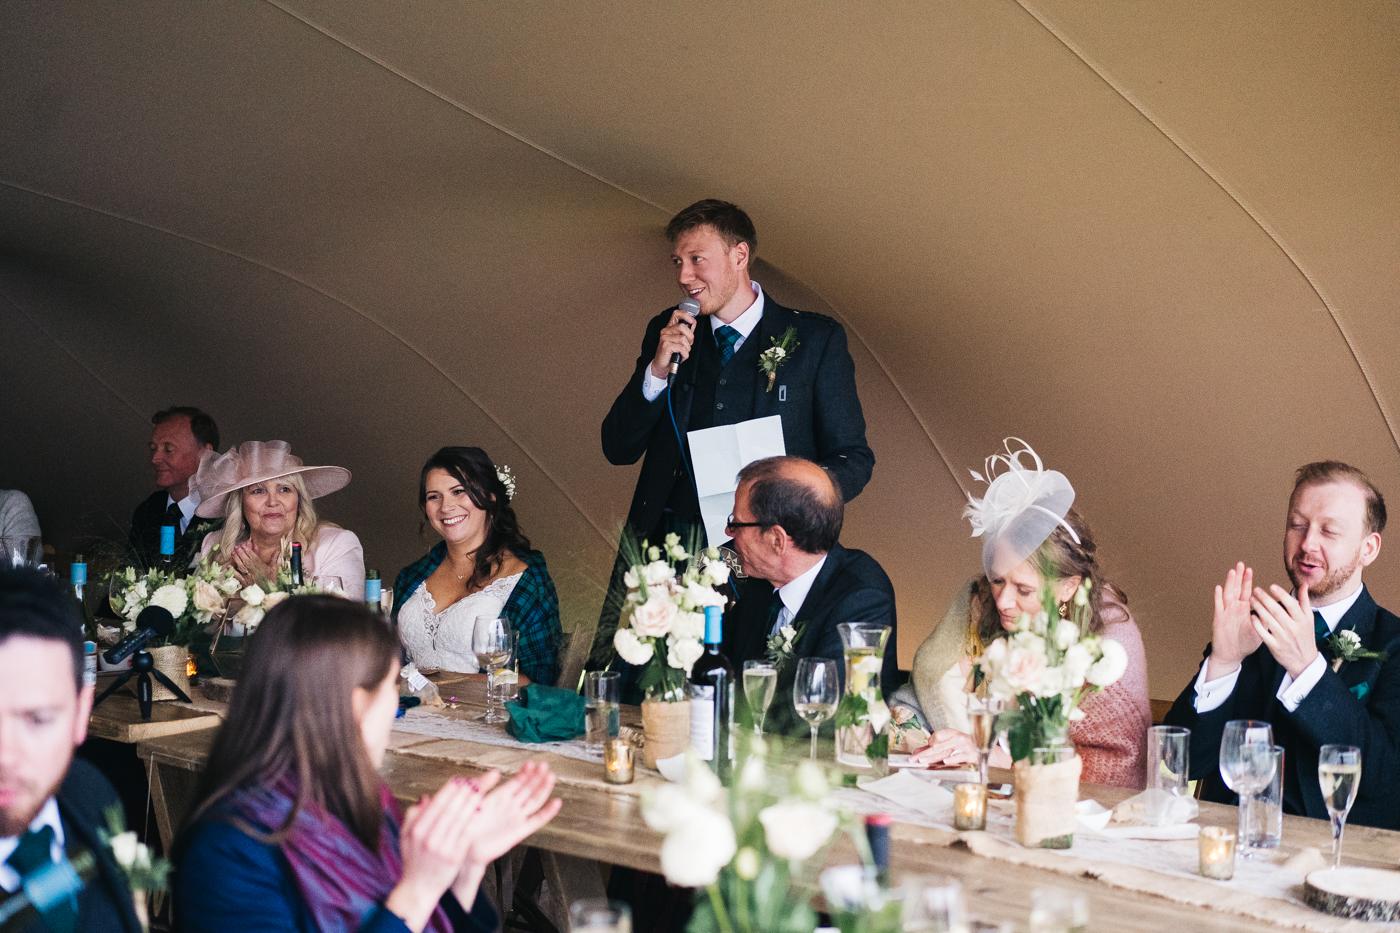 scottish-wedding-trossachs-loch-tay-highlannds-relaxed-photography-photographer-0043.jpg